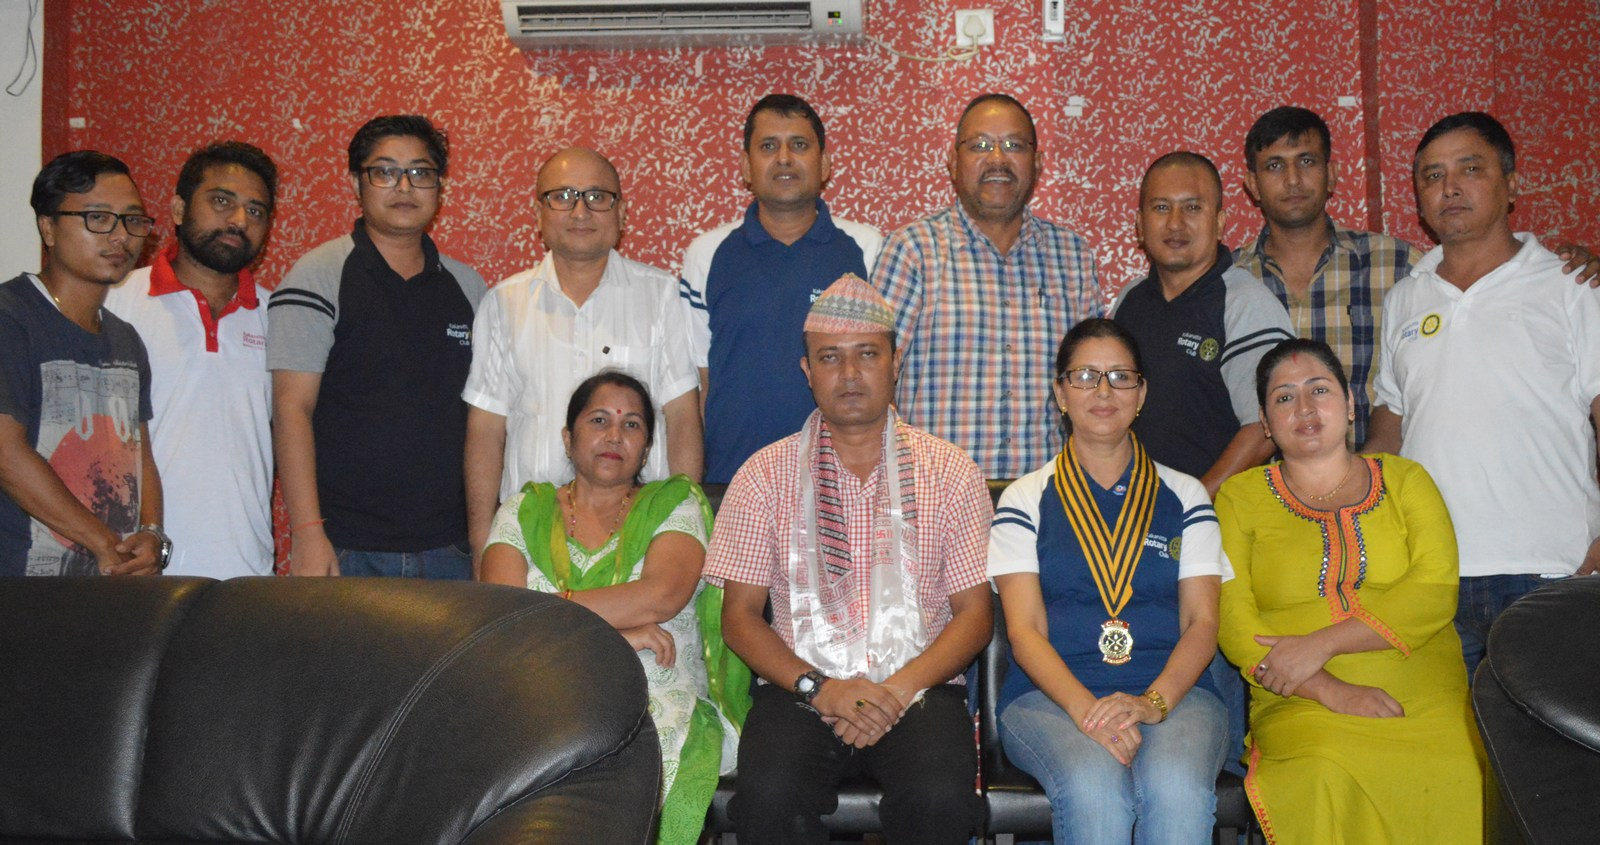 Weekly-Meeting-with-the-Guest-Speaker-DSP-Durga-Raj-Regmi-Rotary-Club-of-Kakarvitta-17